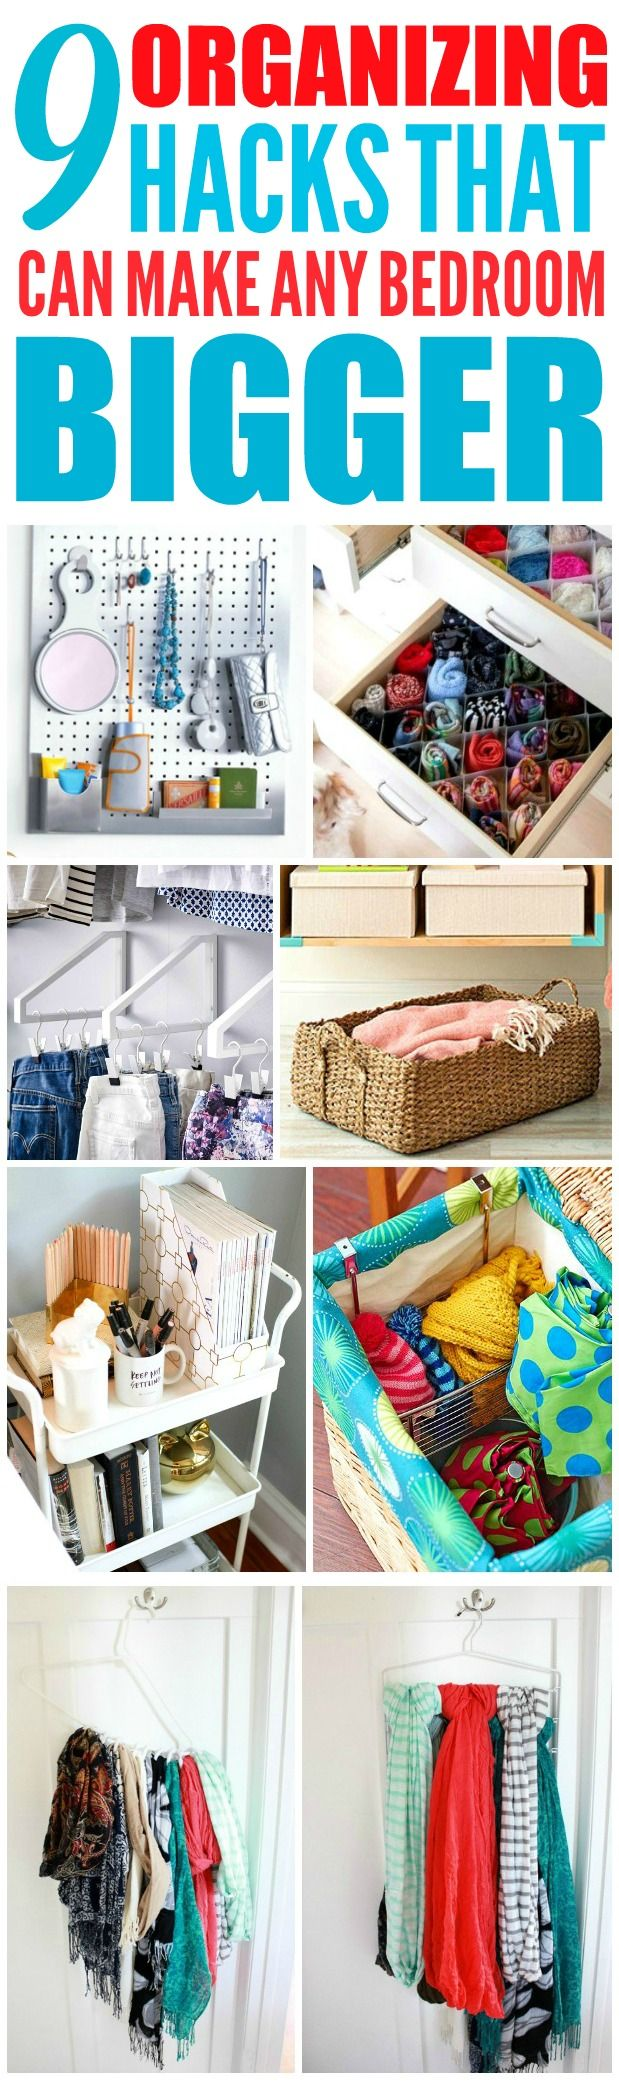 Best 25+ Bedroom organization tips ideas on Pinterest